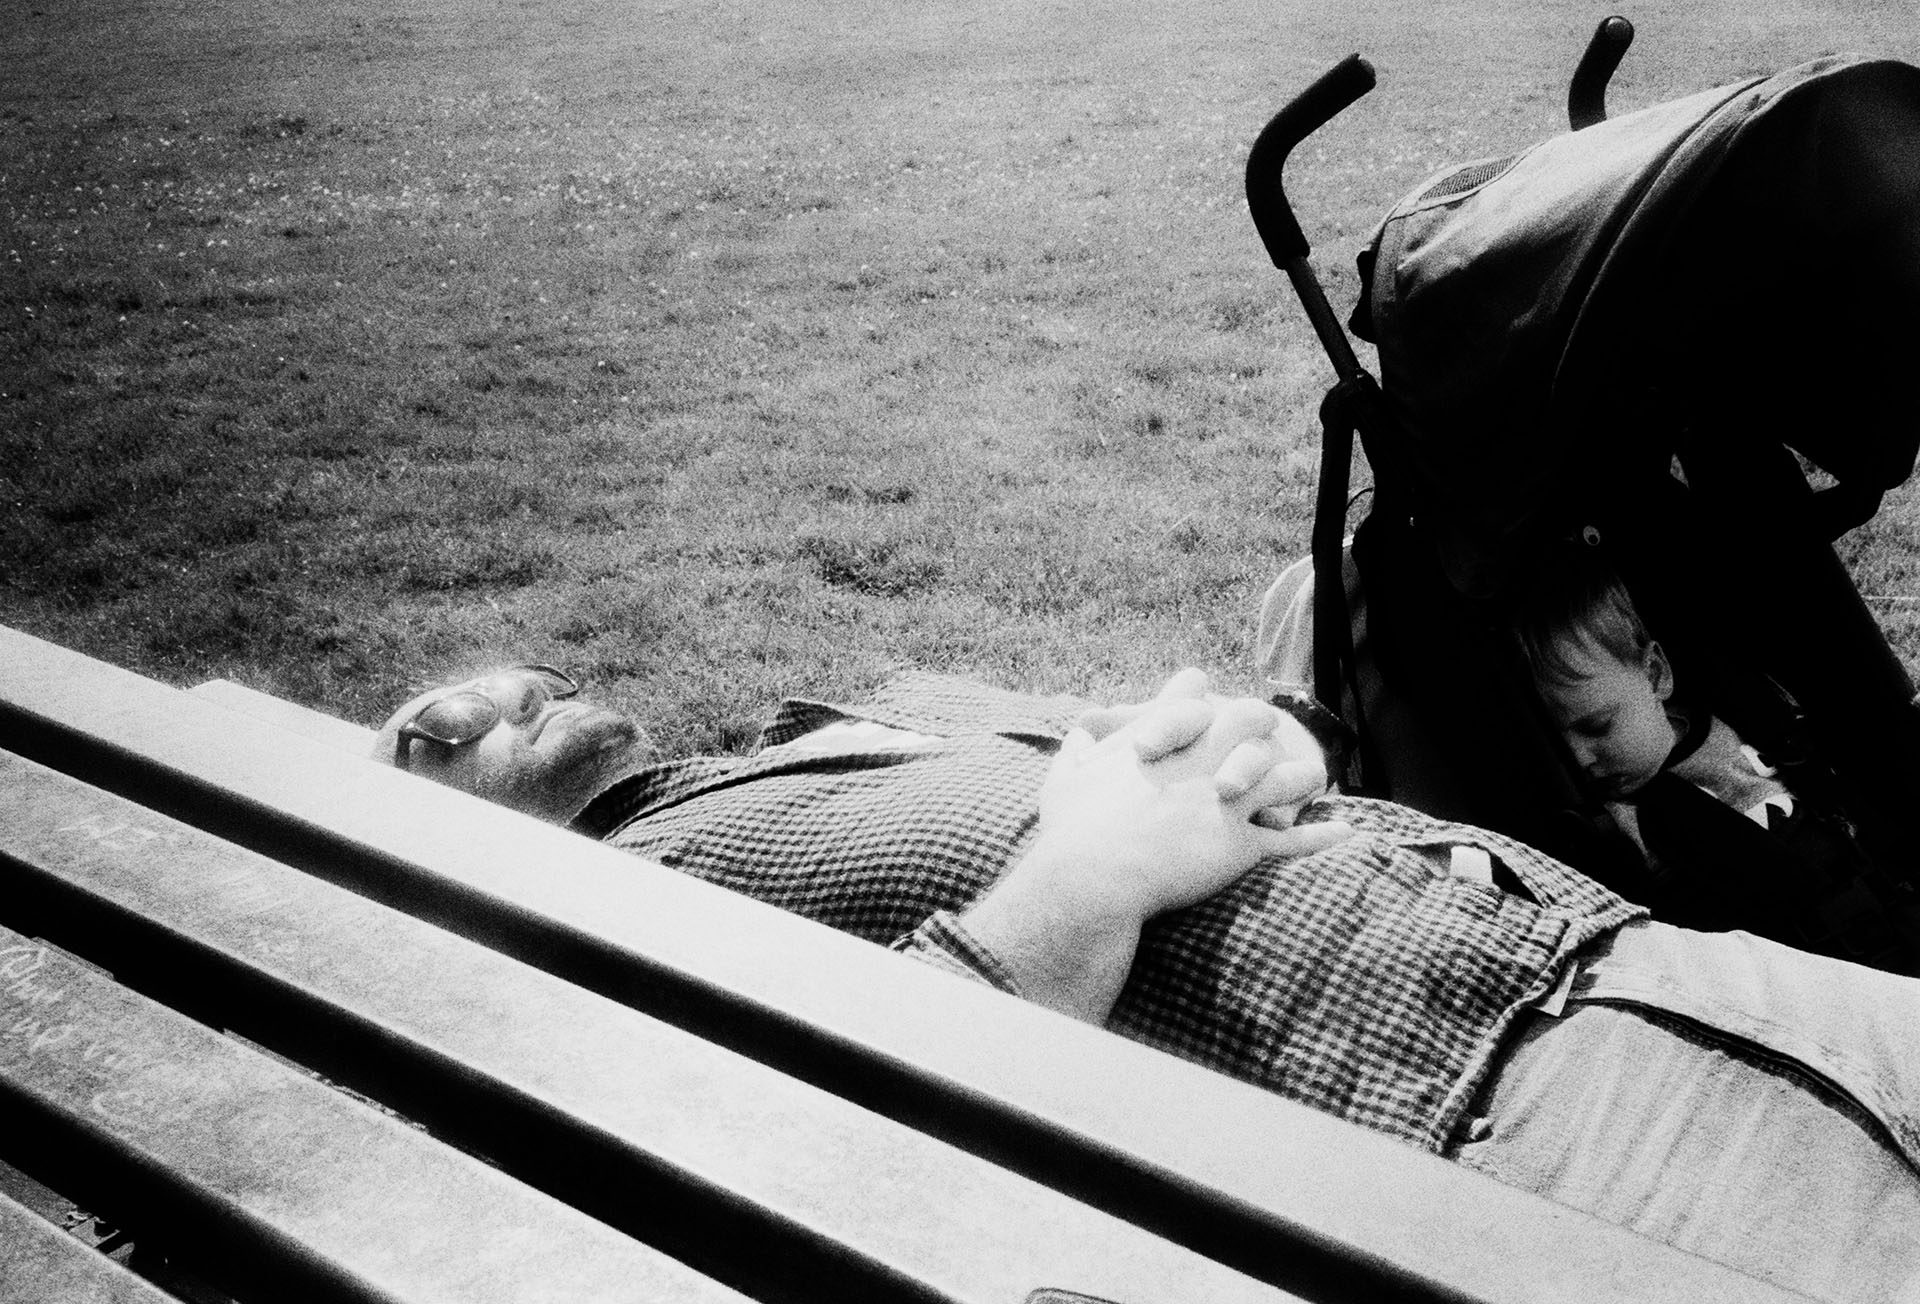 Leica M2 35mm